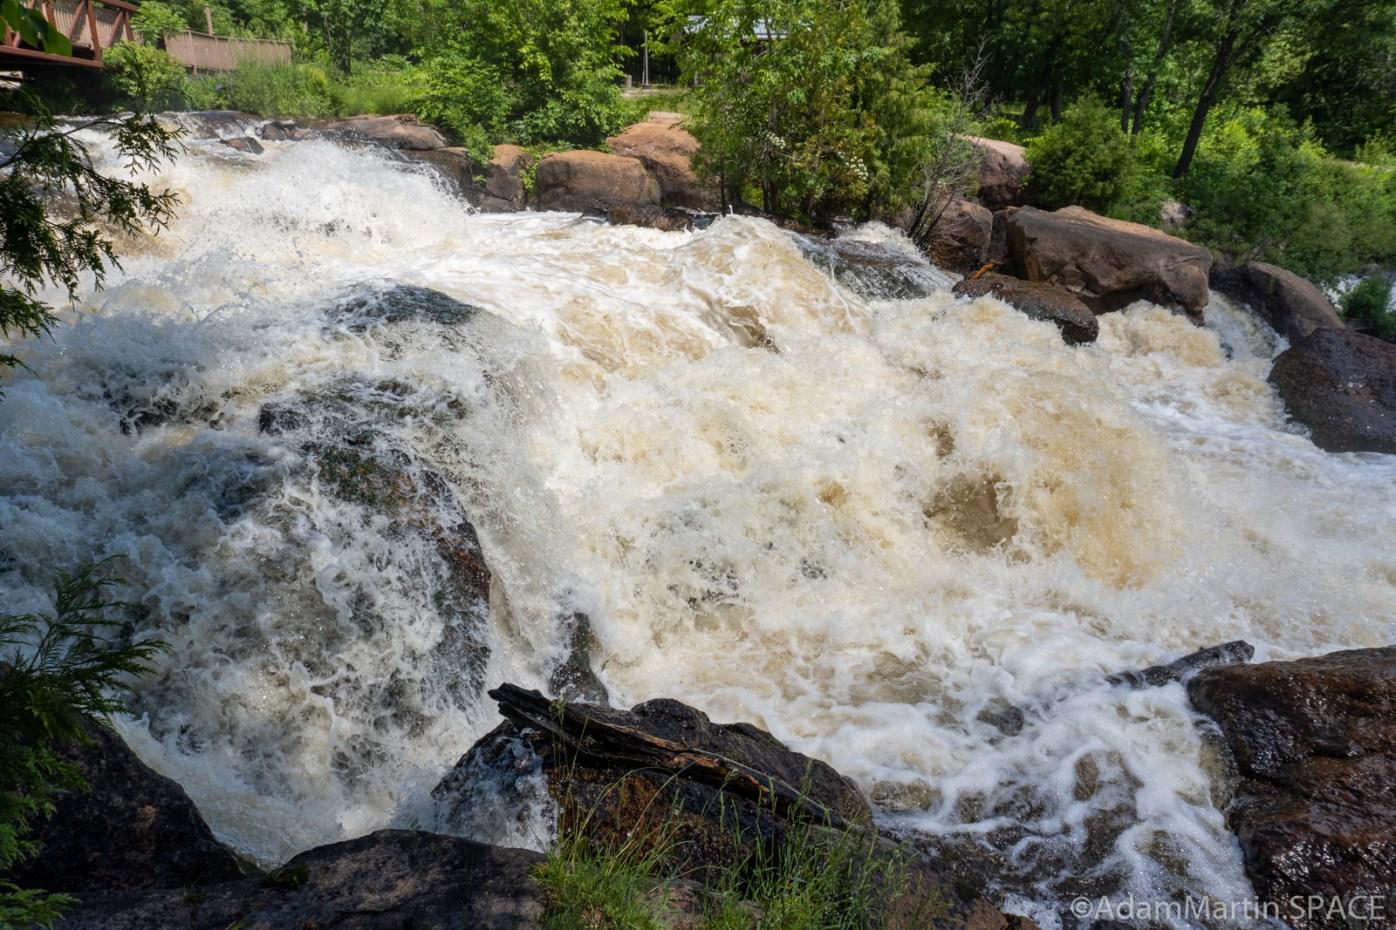 Big Smokey Falls - Beside/below the first falls